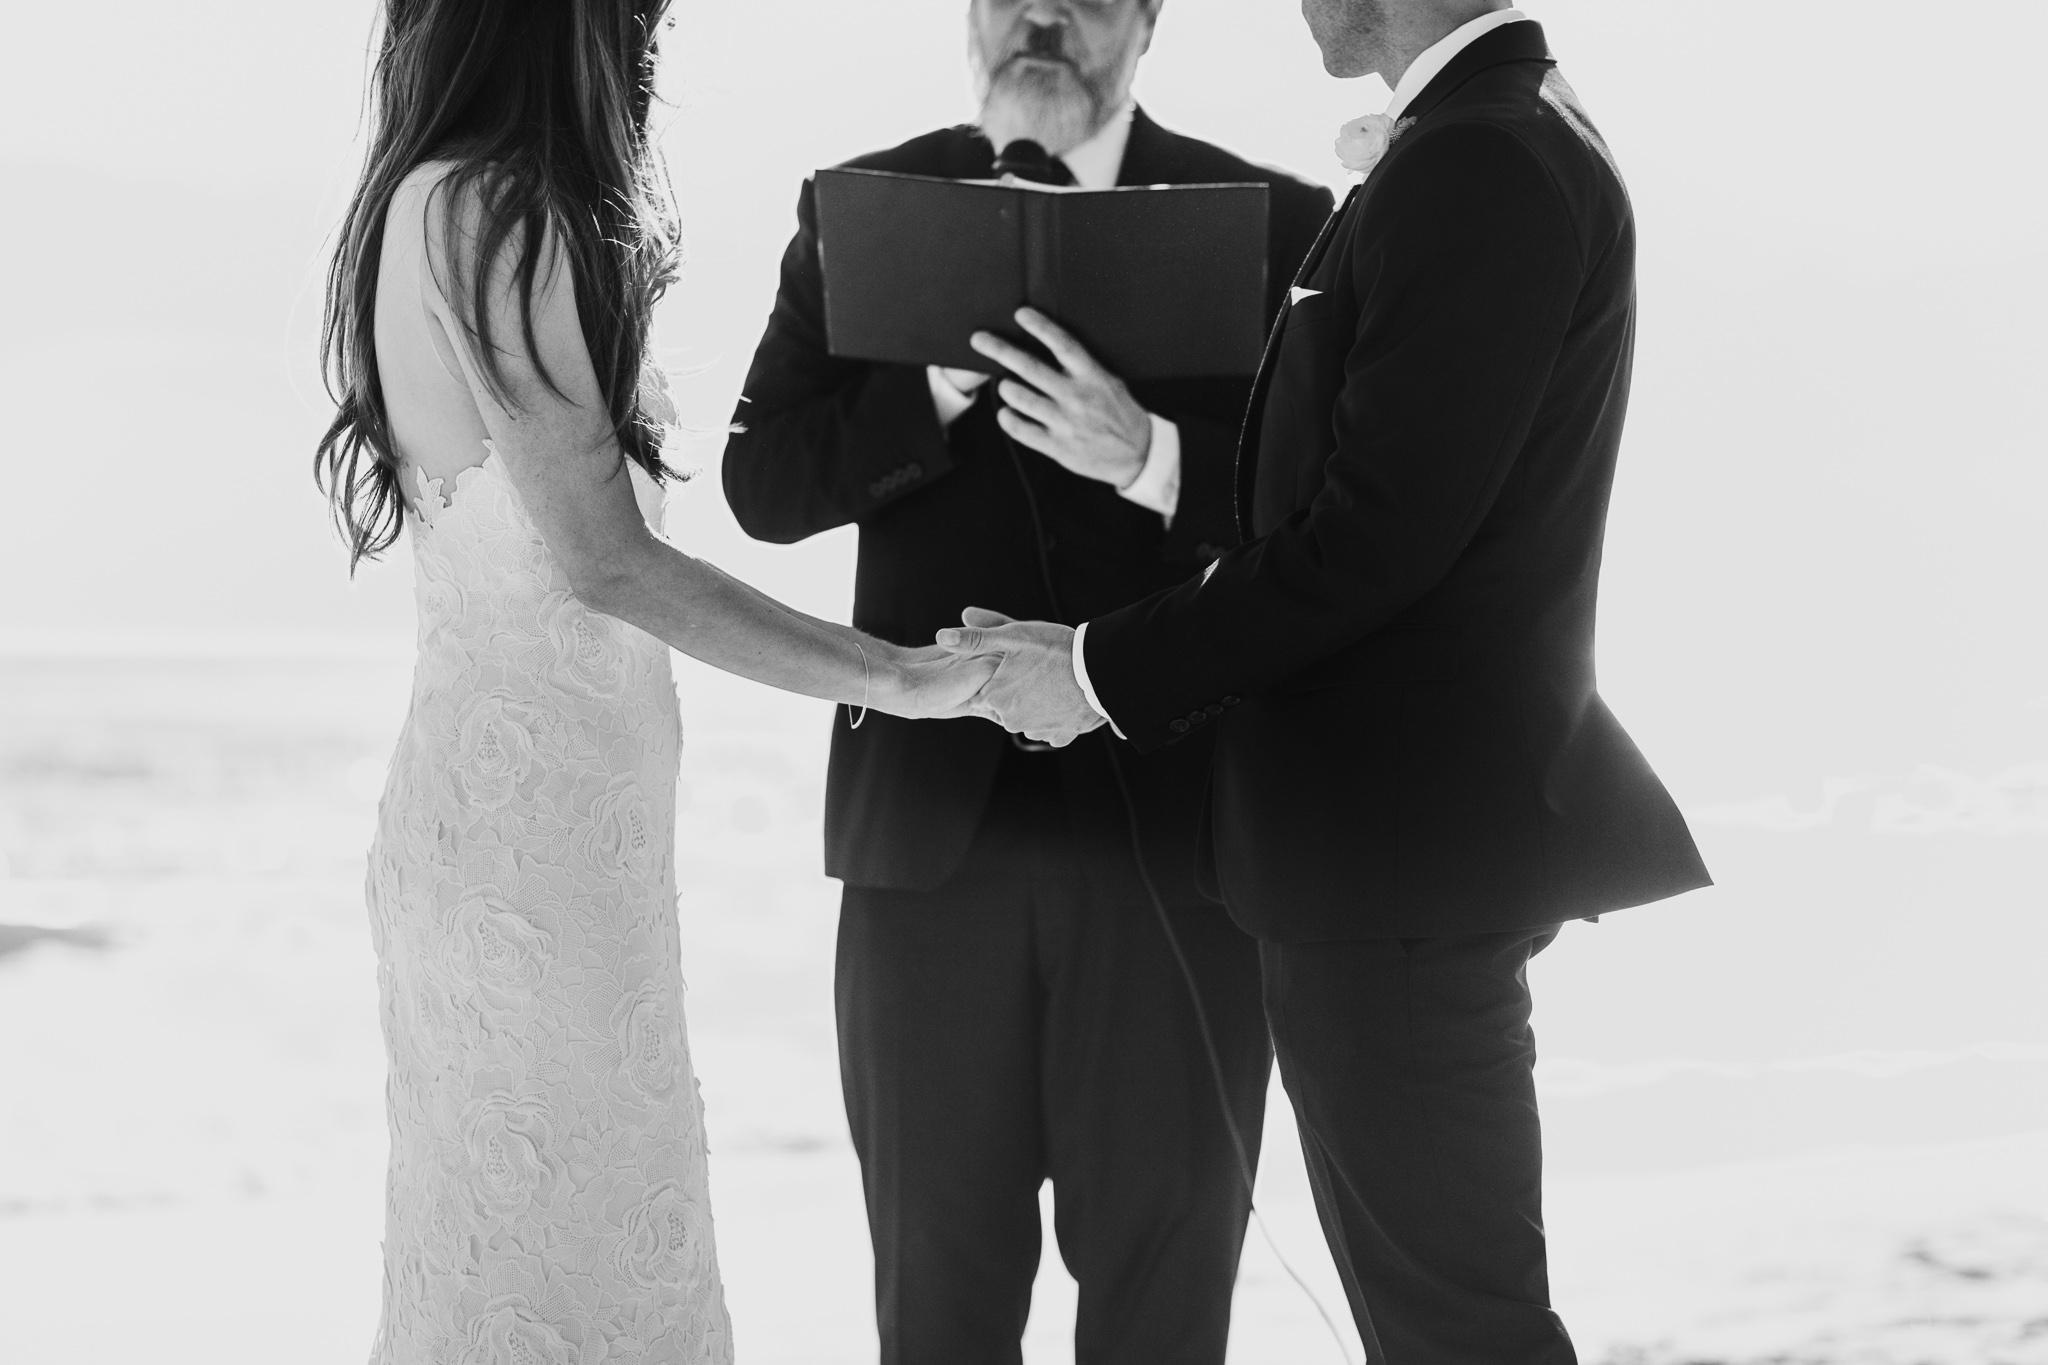 LagunaBeach-WeddingPhotographer-38.jpg